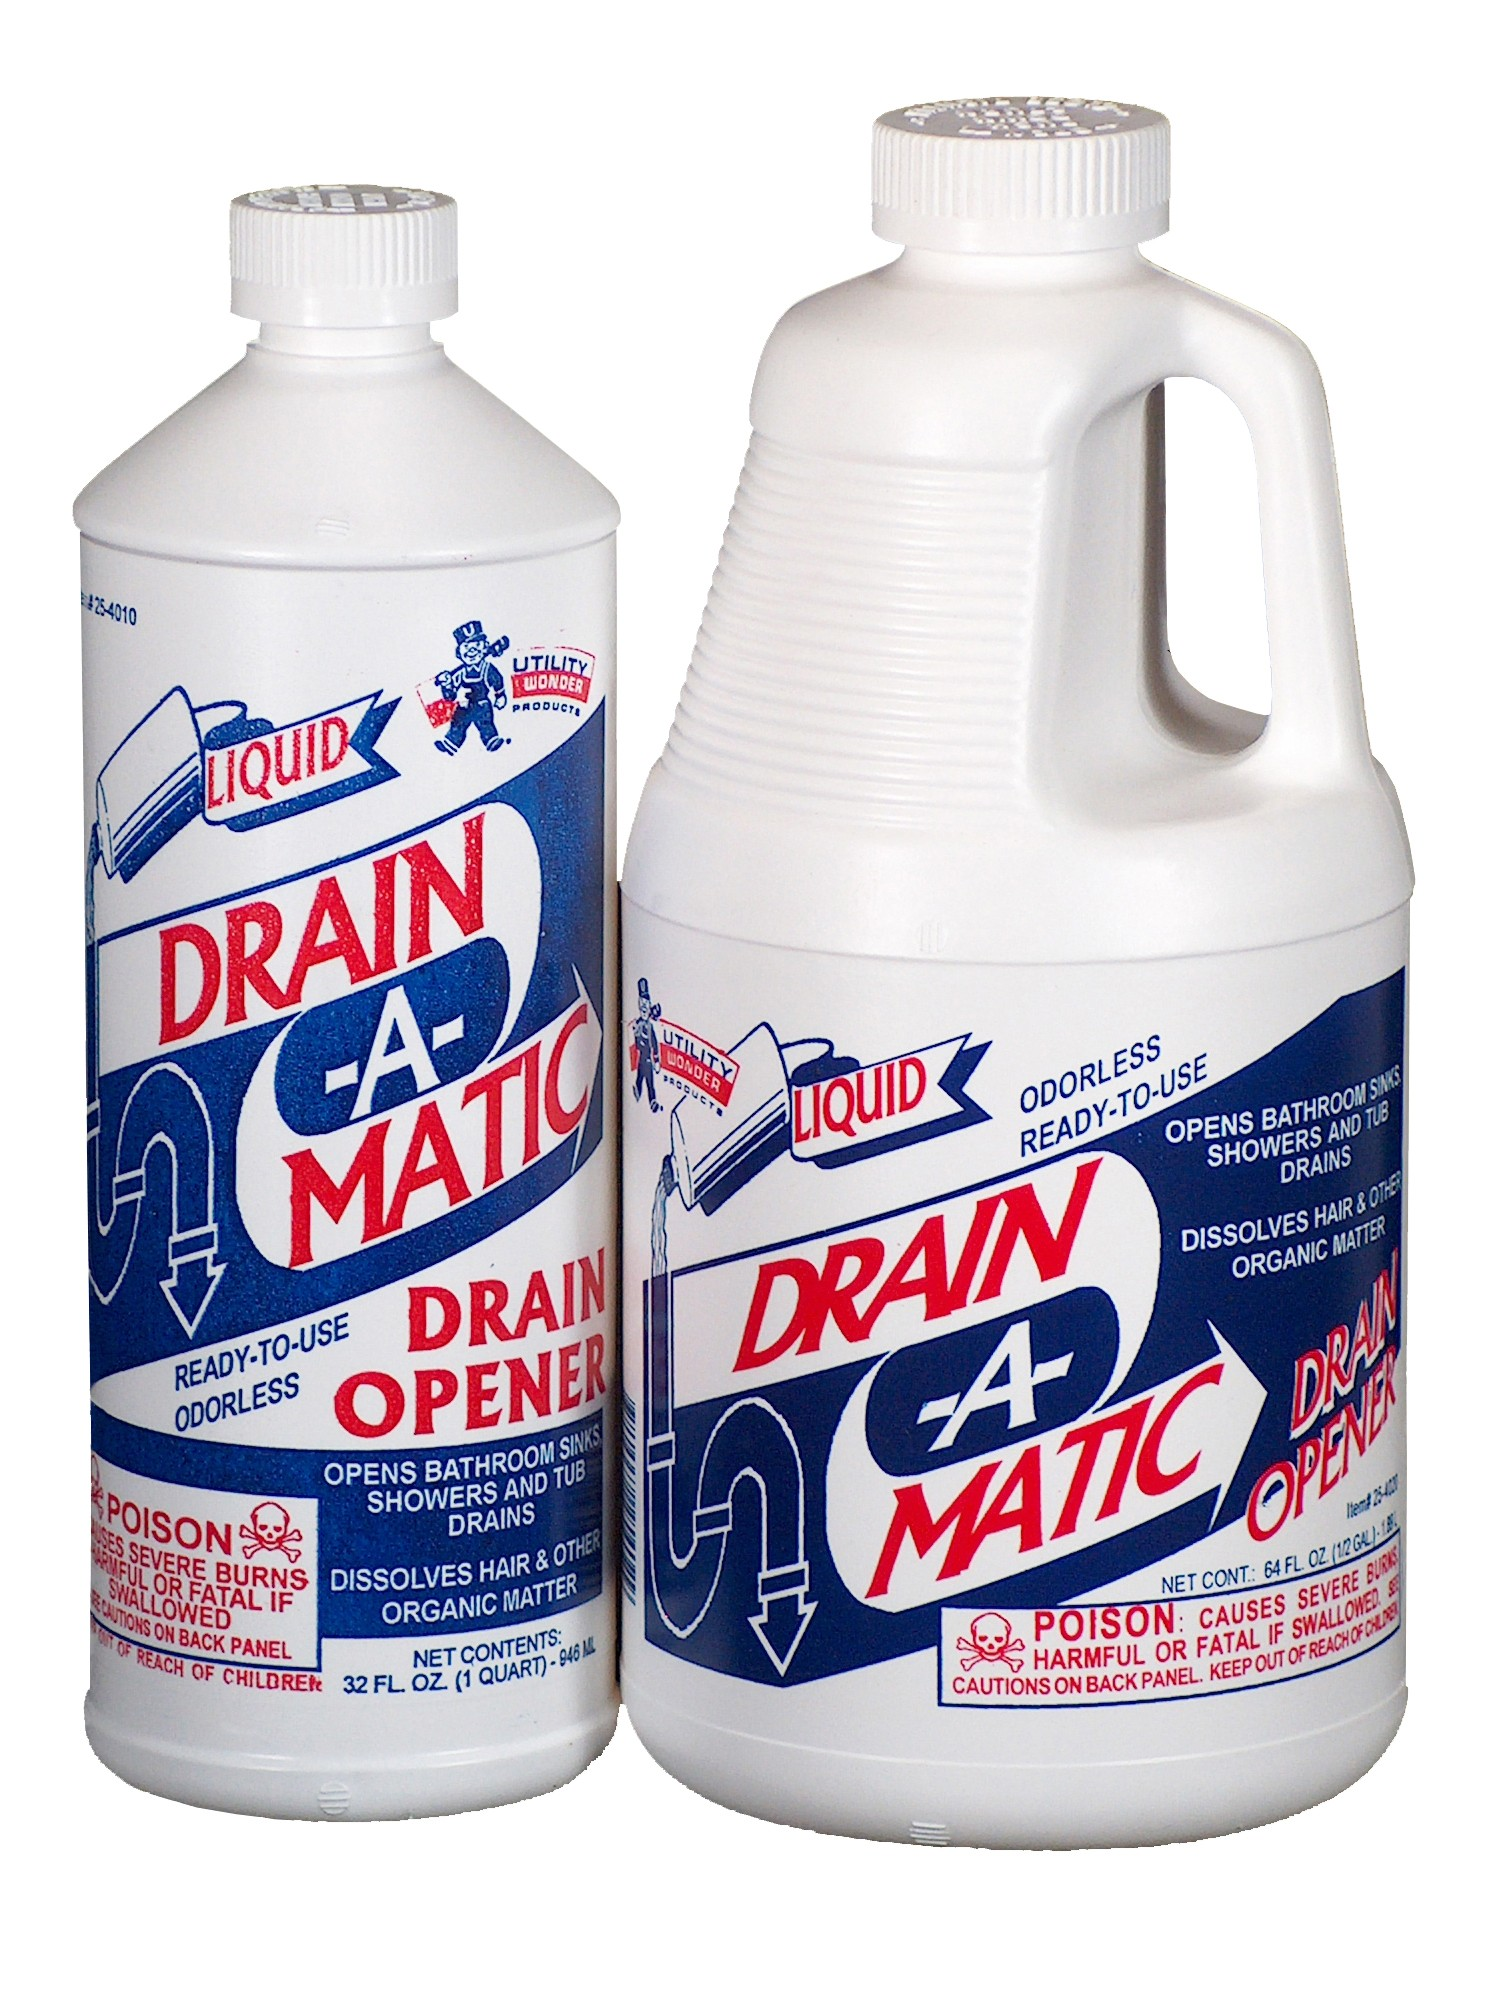 LIQUID DRAIN-A-MATIC DRAIN OPENER